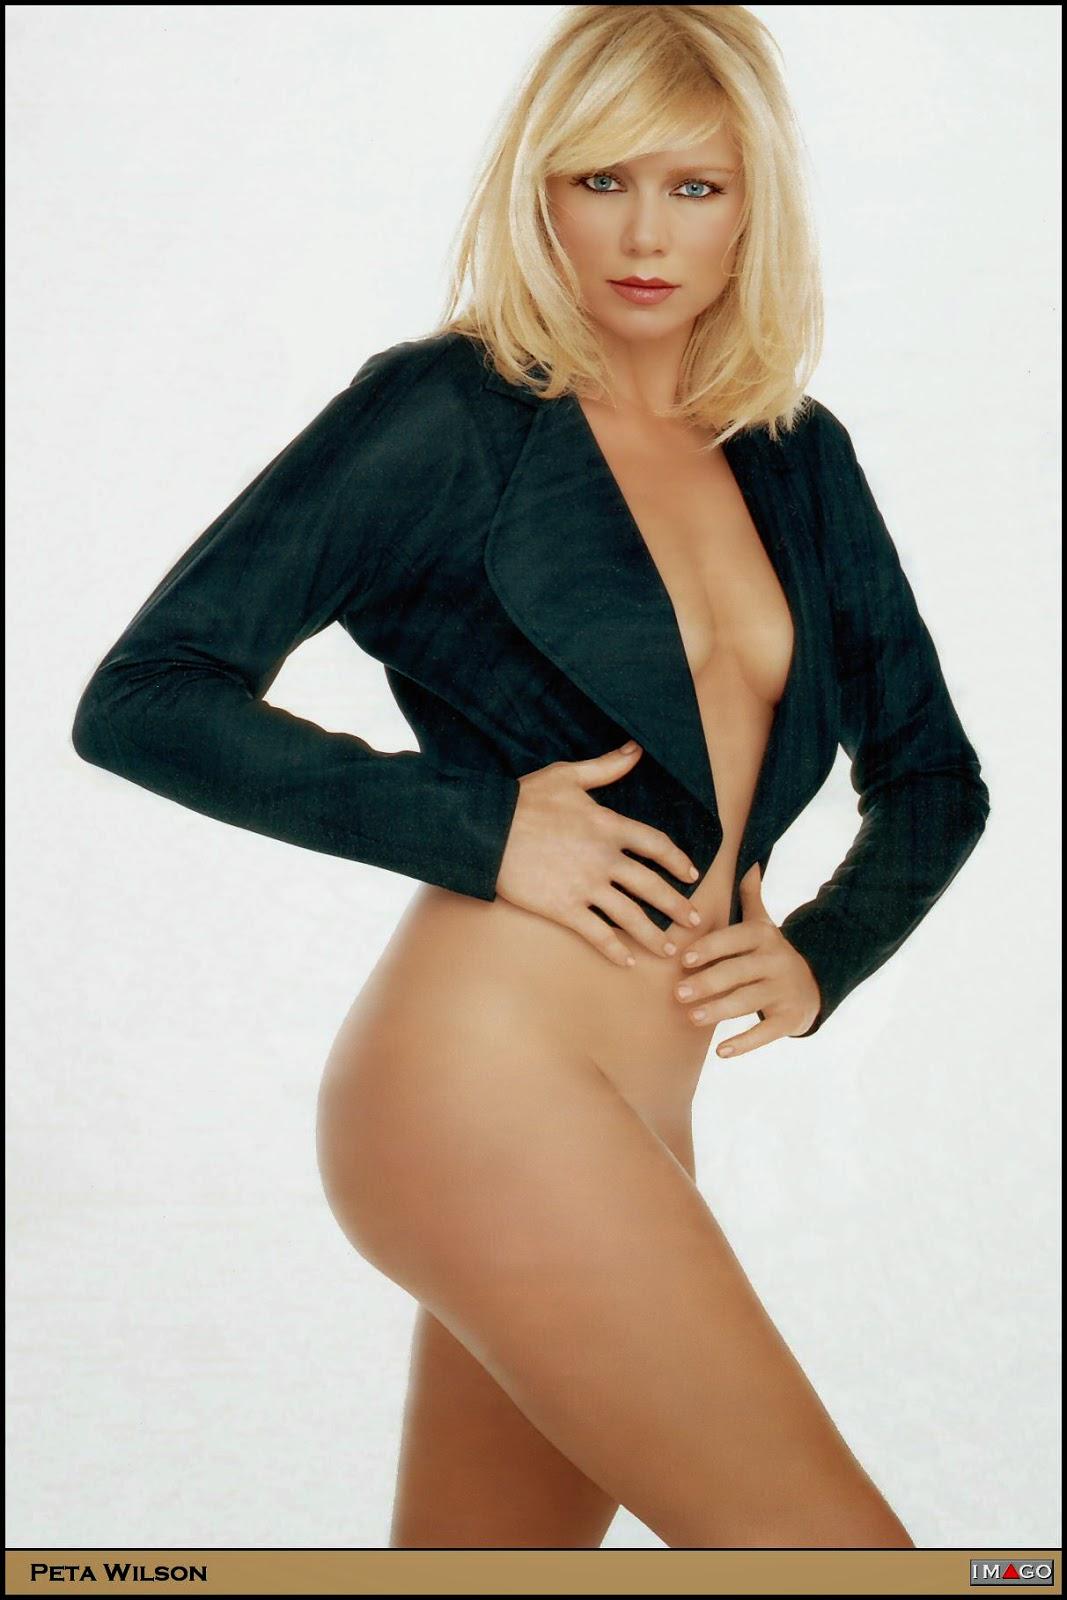 pita wilson nude pictures looks